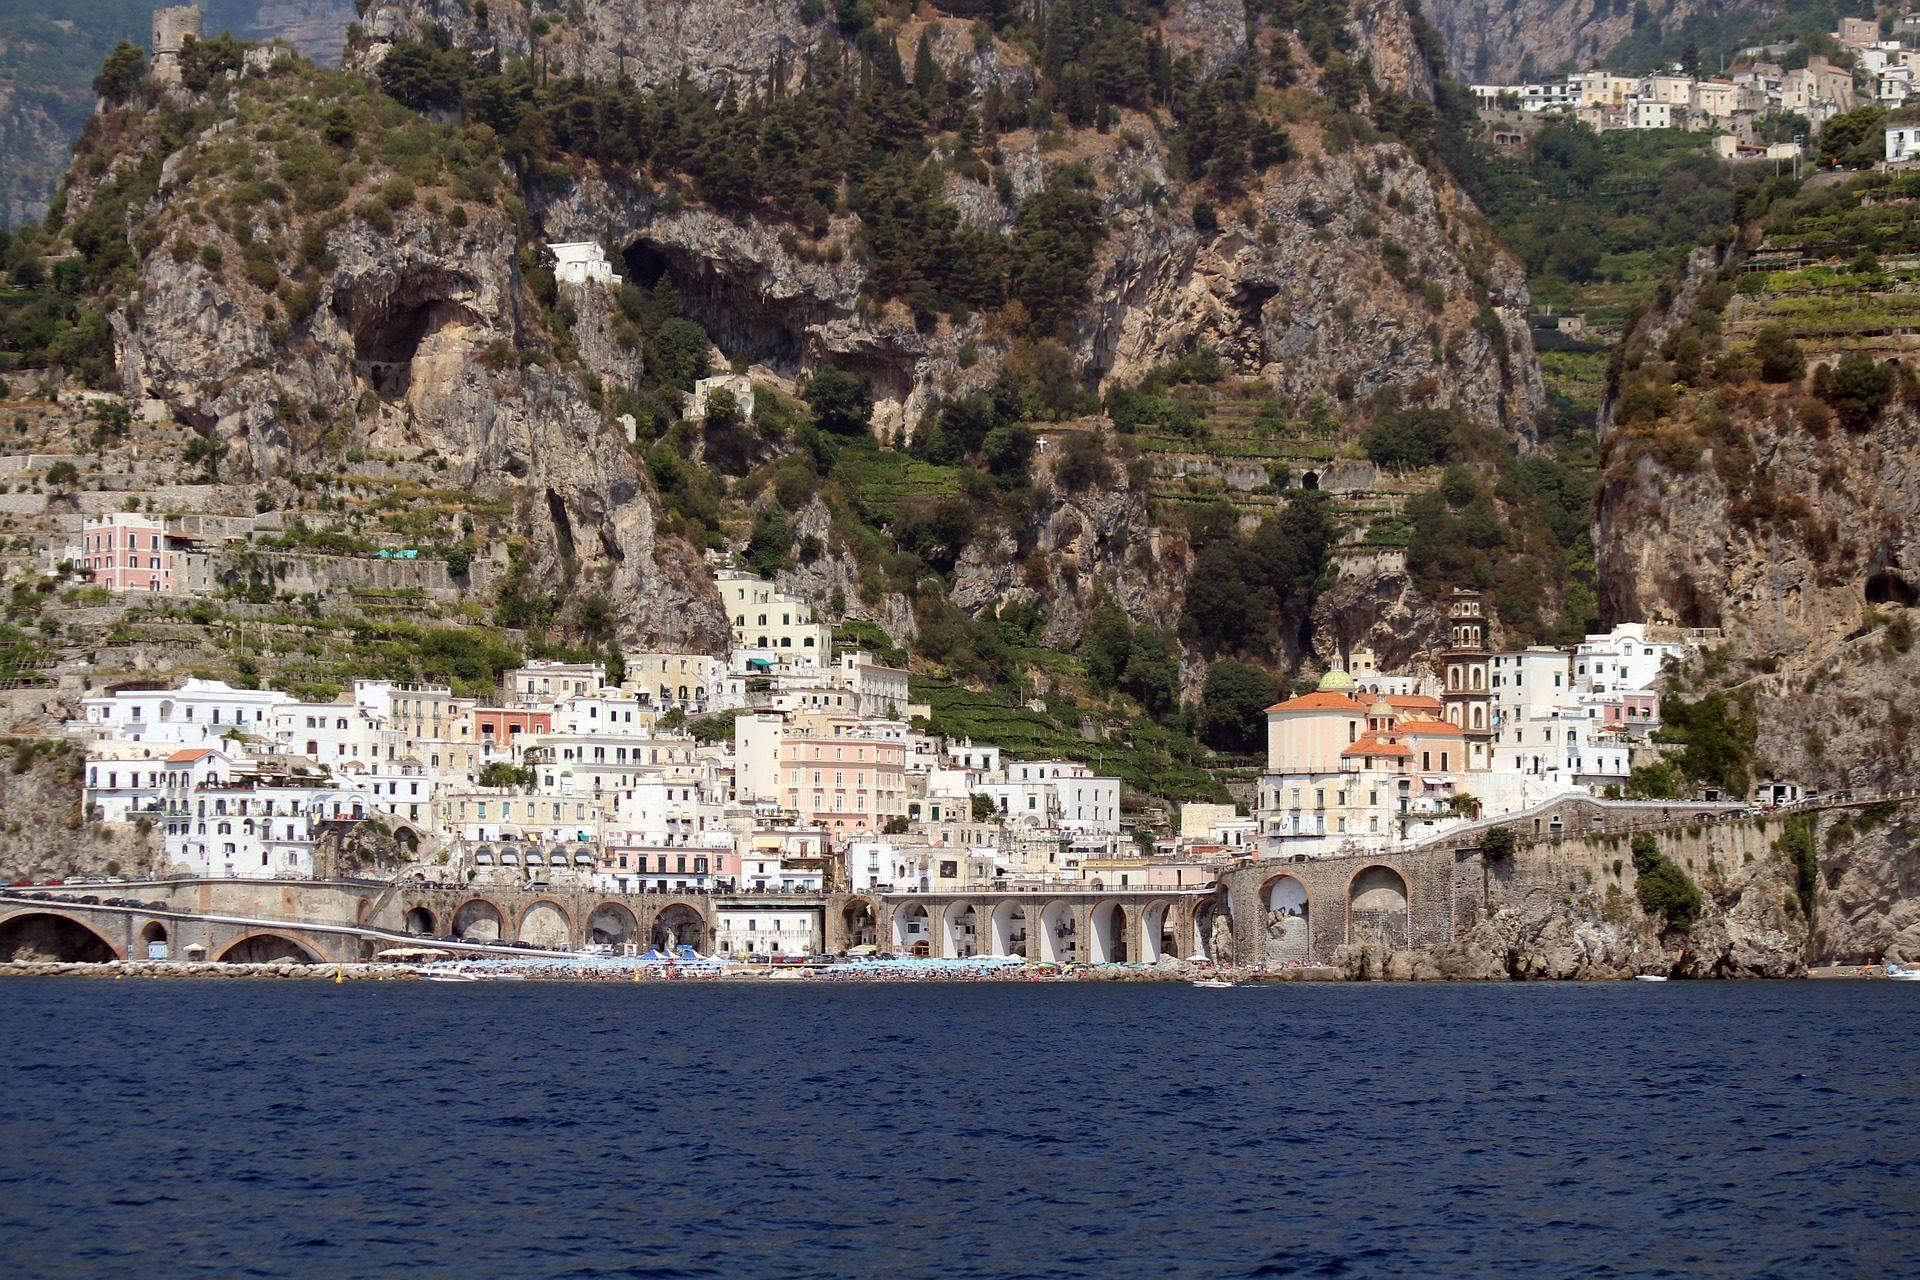 Villaggio, Costa, Mare, Montañas, Cliff, atrani - Sfondi HD - Professor-falken.com